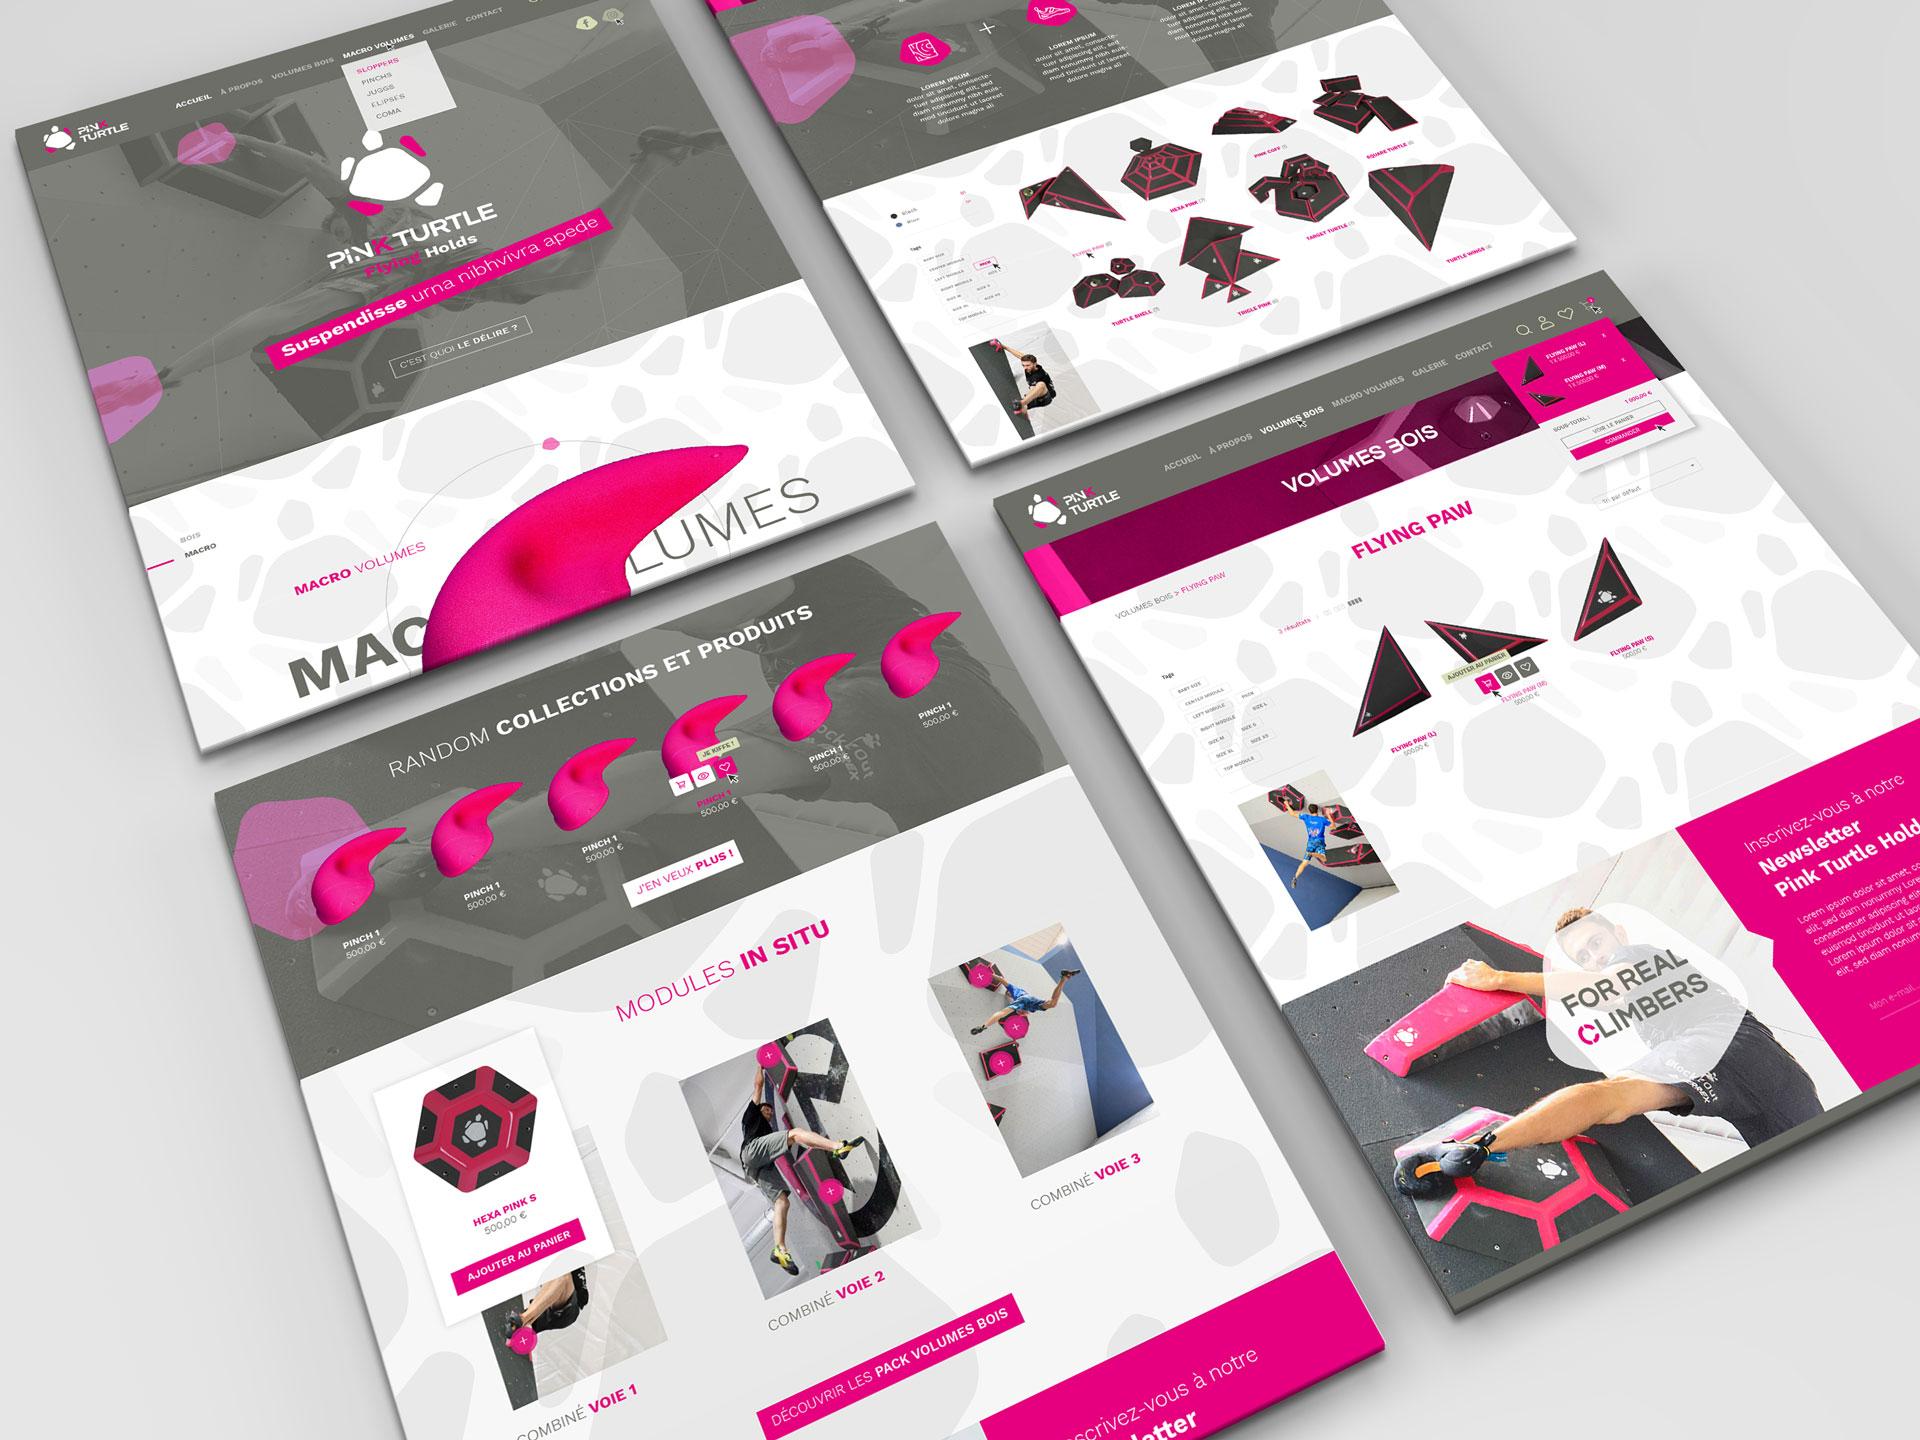 UI site Pink Turtle-Cmondada Design